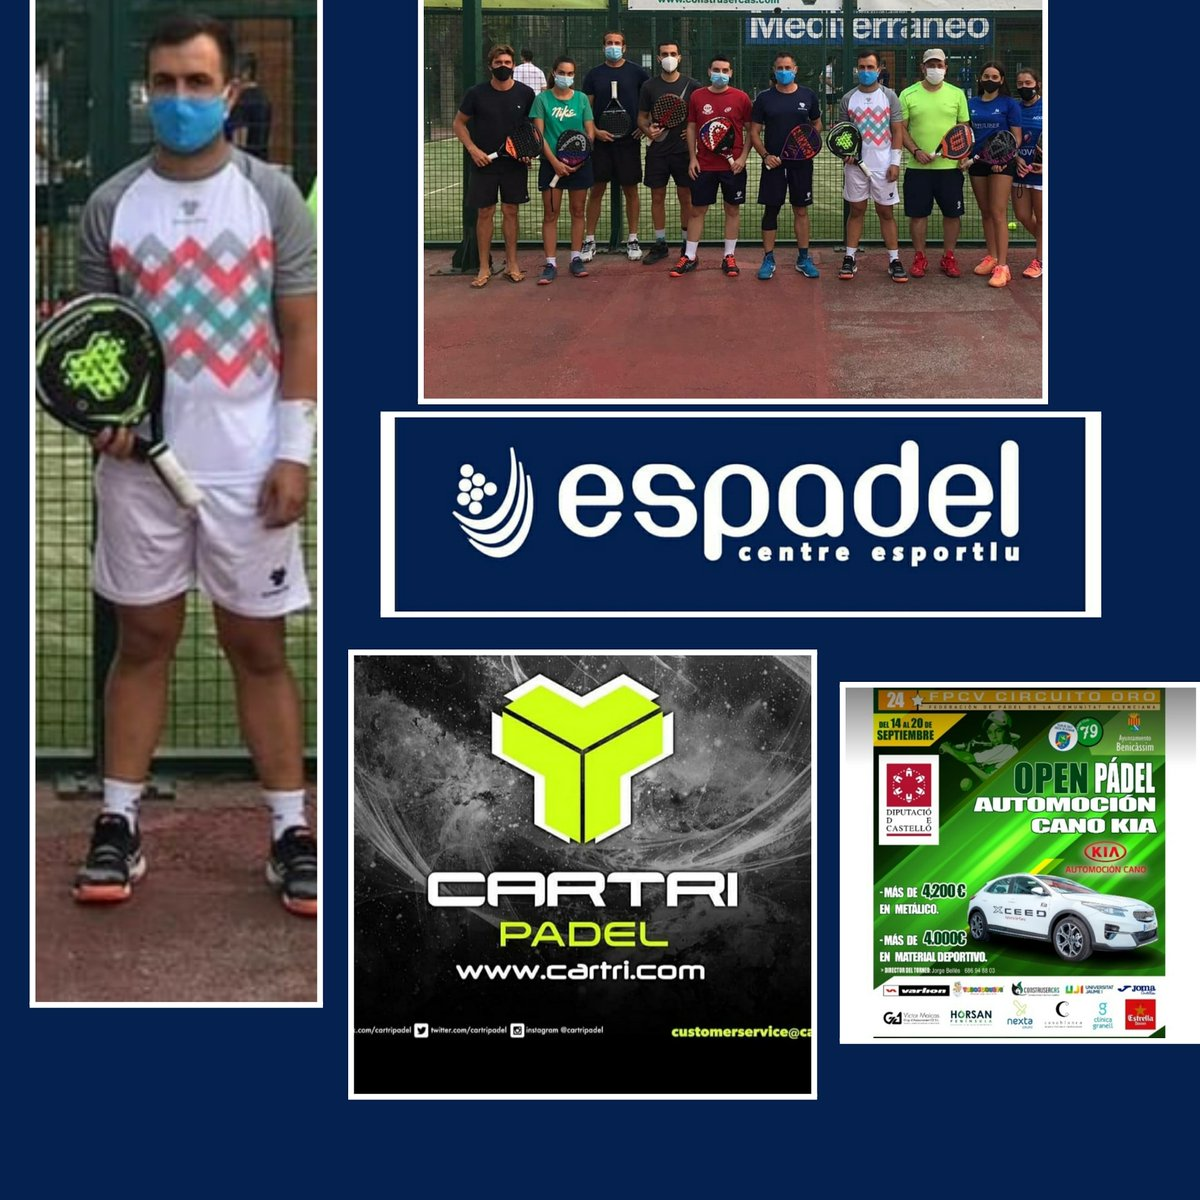 TORNEO ORO 24* AUTOMOCION KIA  @cartripadel @espadelburriana #cartripadel #cartri #teamcartri #equipocartri #cartriteam  #familiacartri #padel #padeltime #instapadel #ilovepadel #padeladdict #padelmania #padeleros #padelon #padelpeople #padelamateur #deporte #sport #spain https://t.co/S4VXl0uh9c